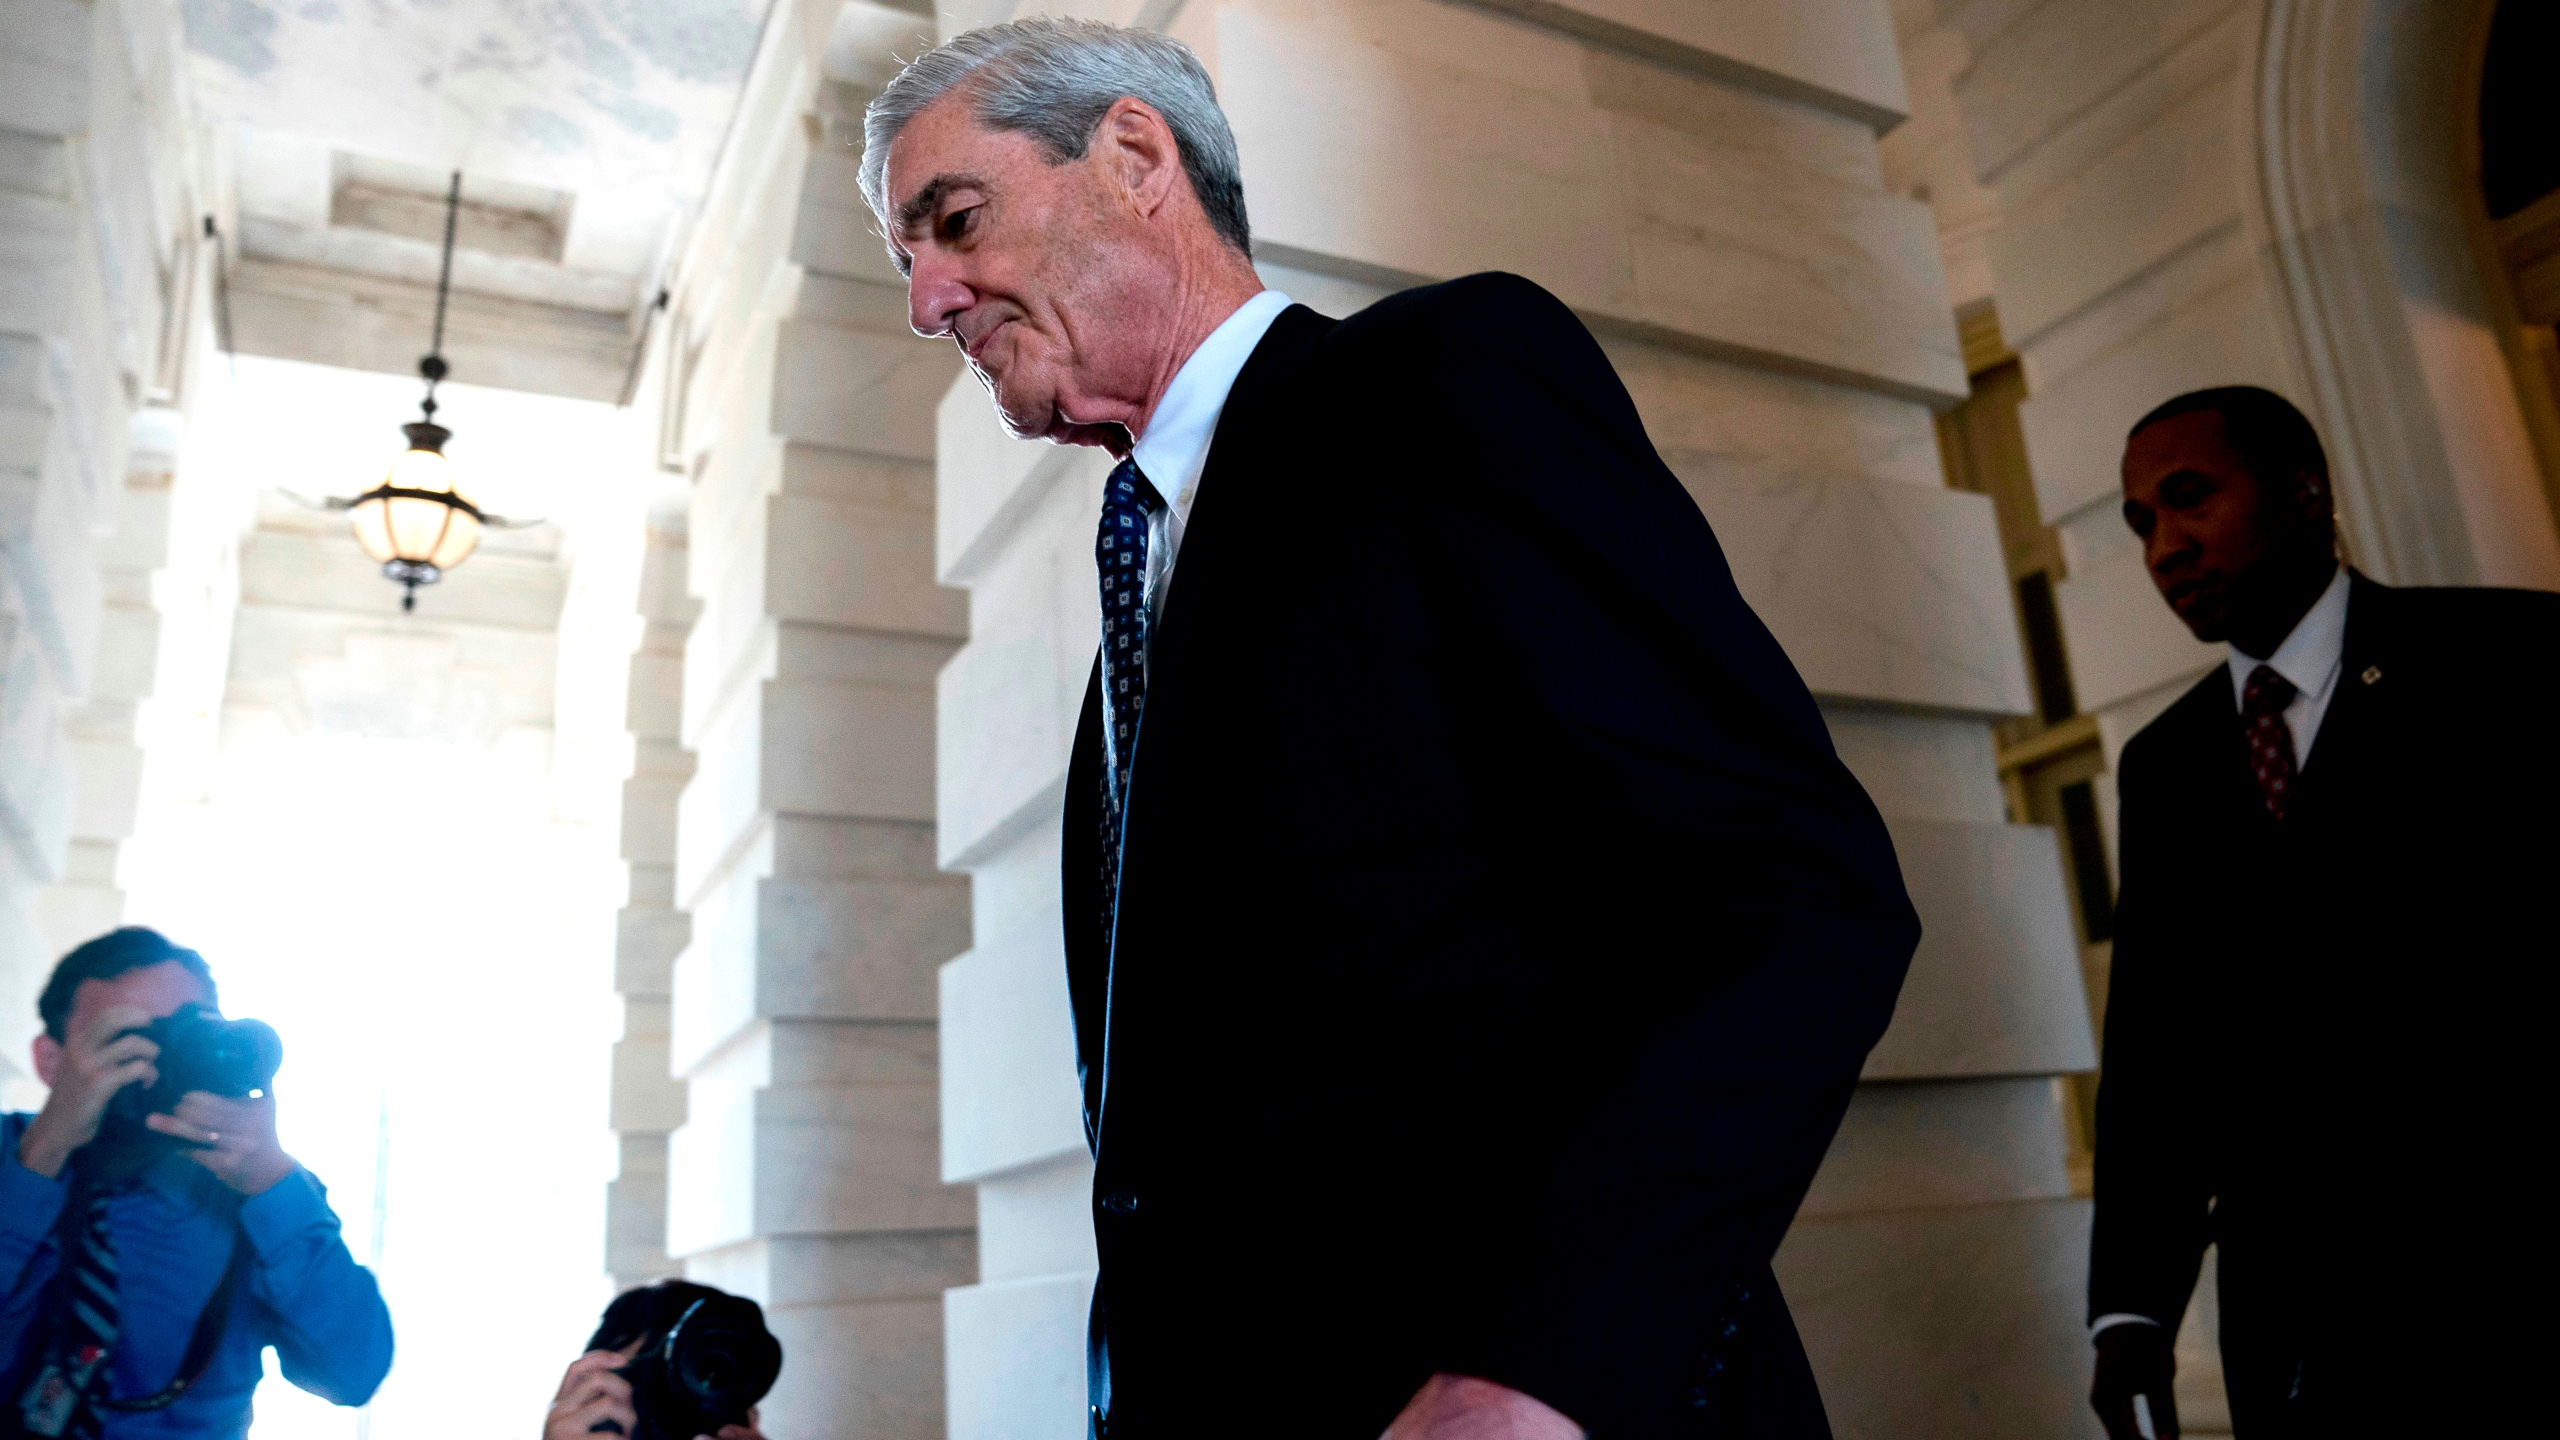 Trump_Russia_Probe_Mueller_80243-159532.jpg19087282